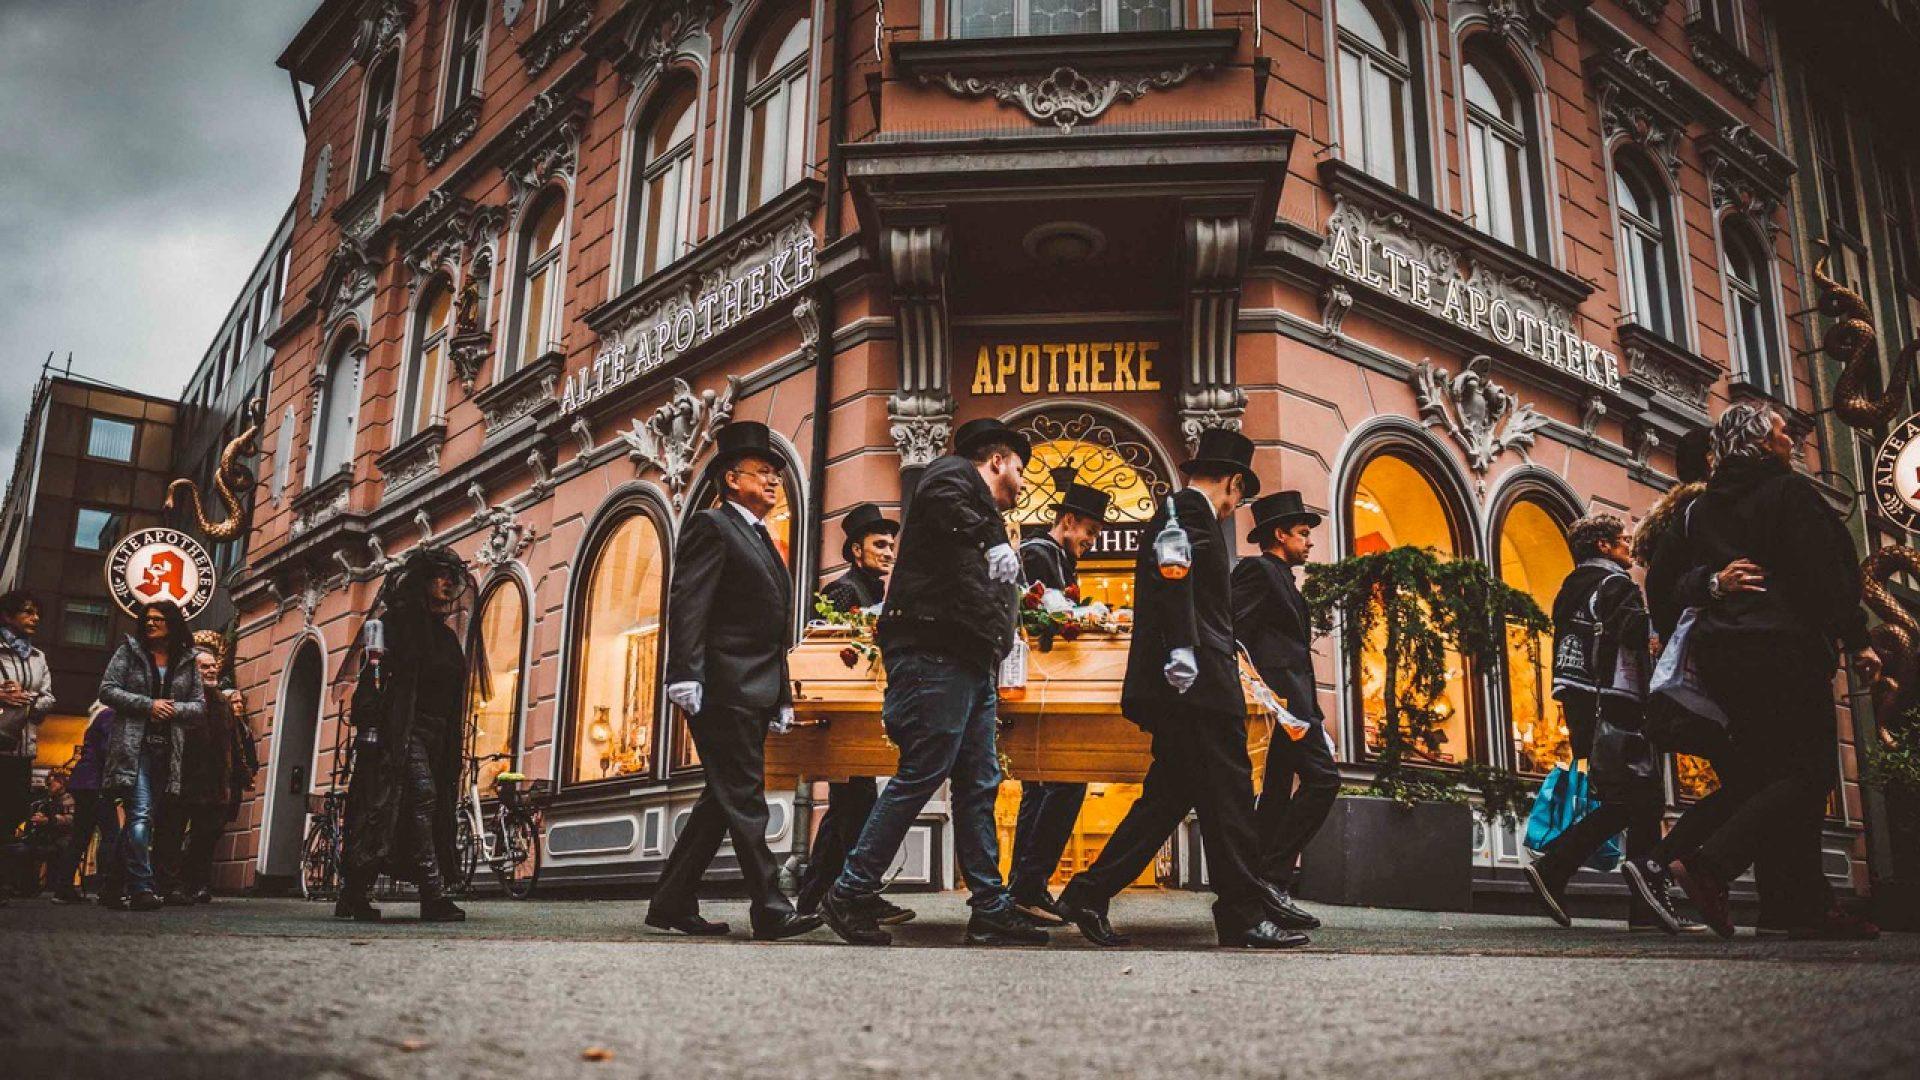 FUNKE Foto Services / Fabian Strauch